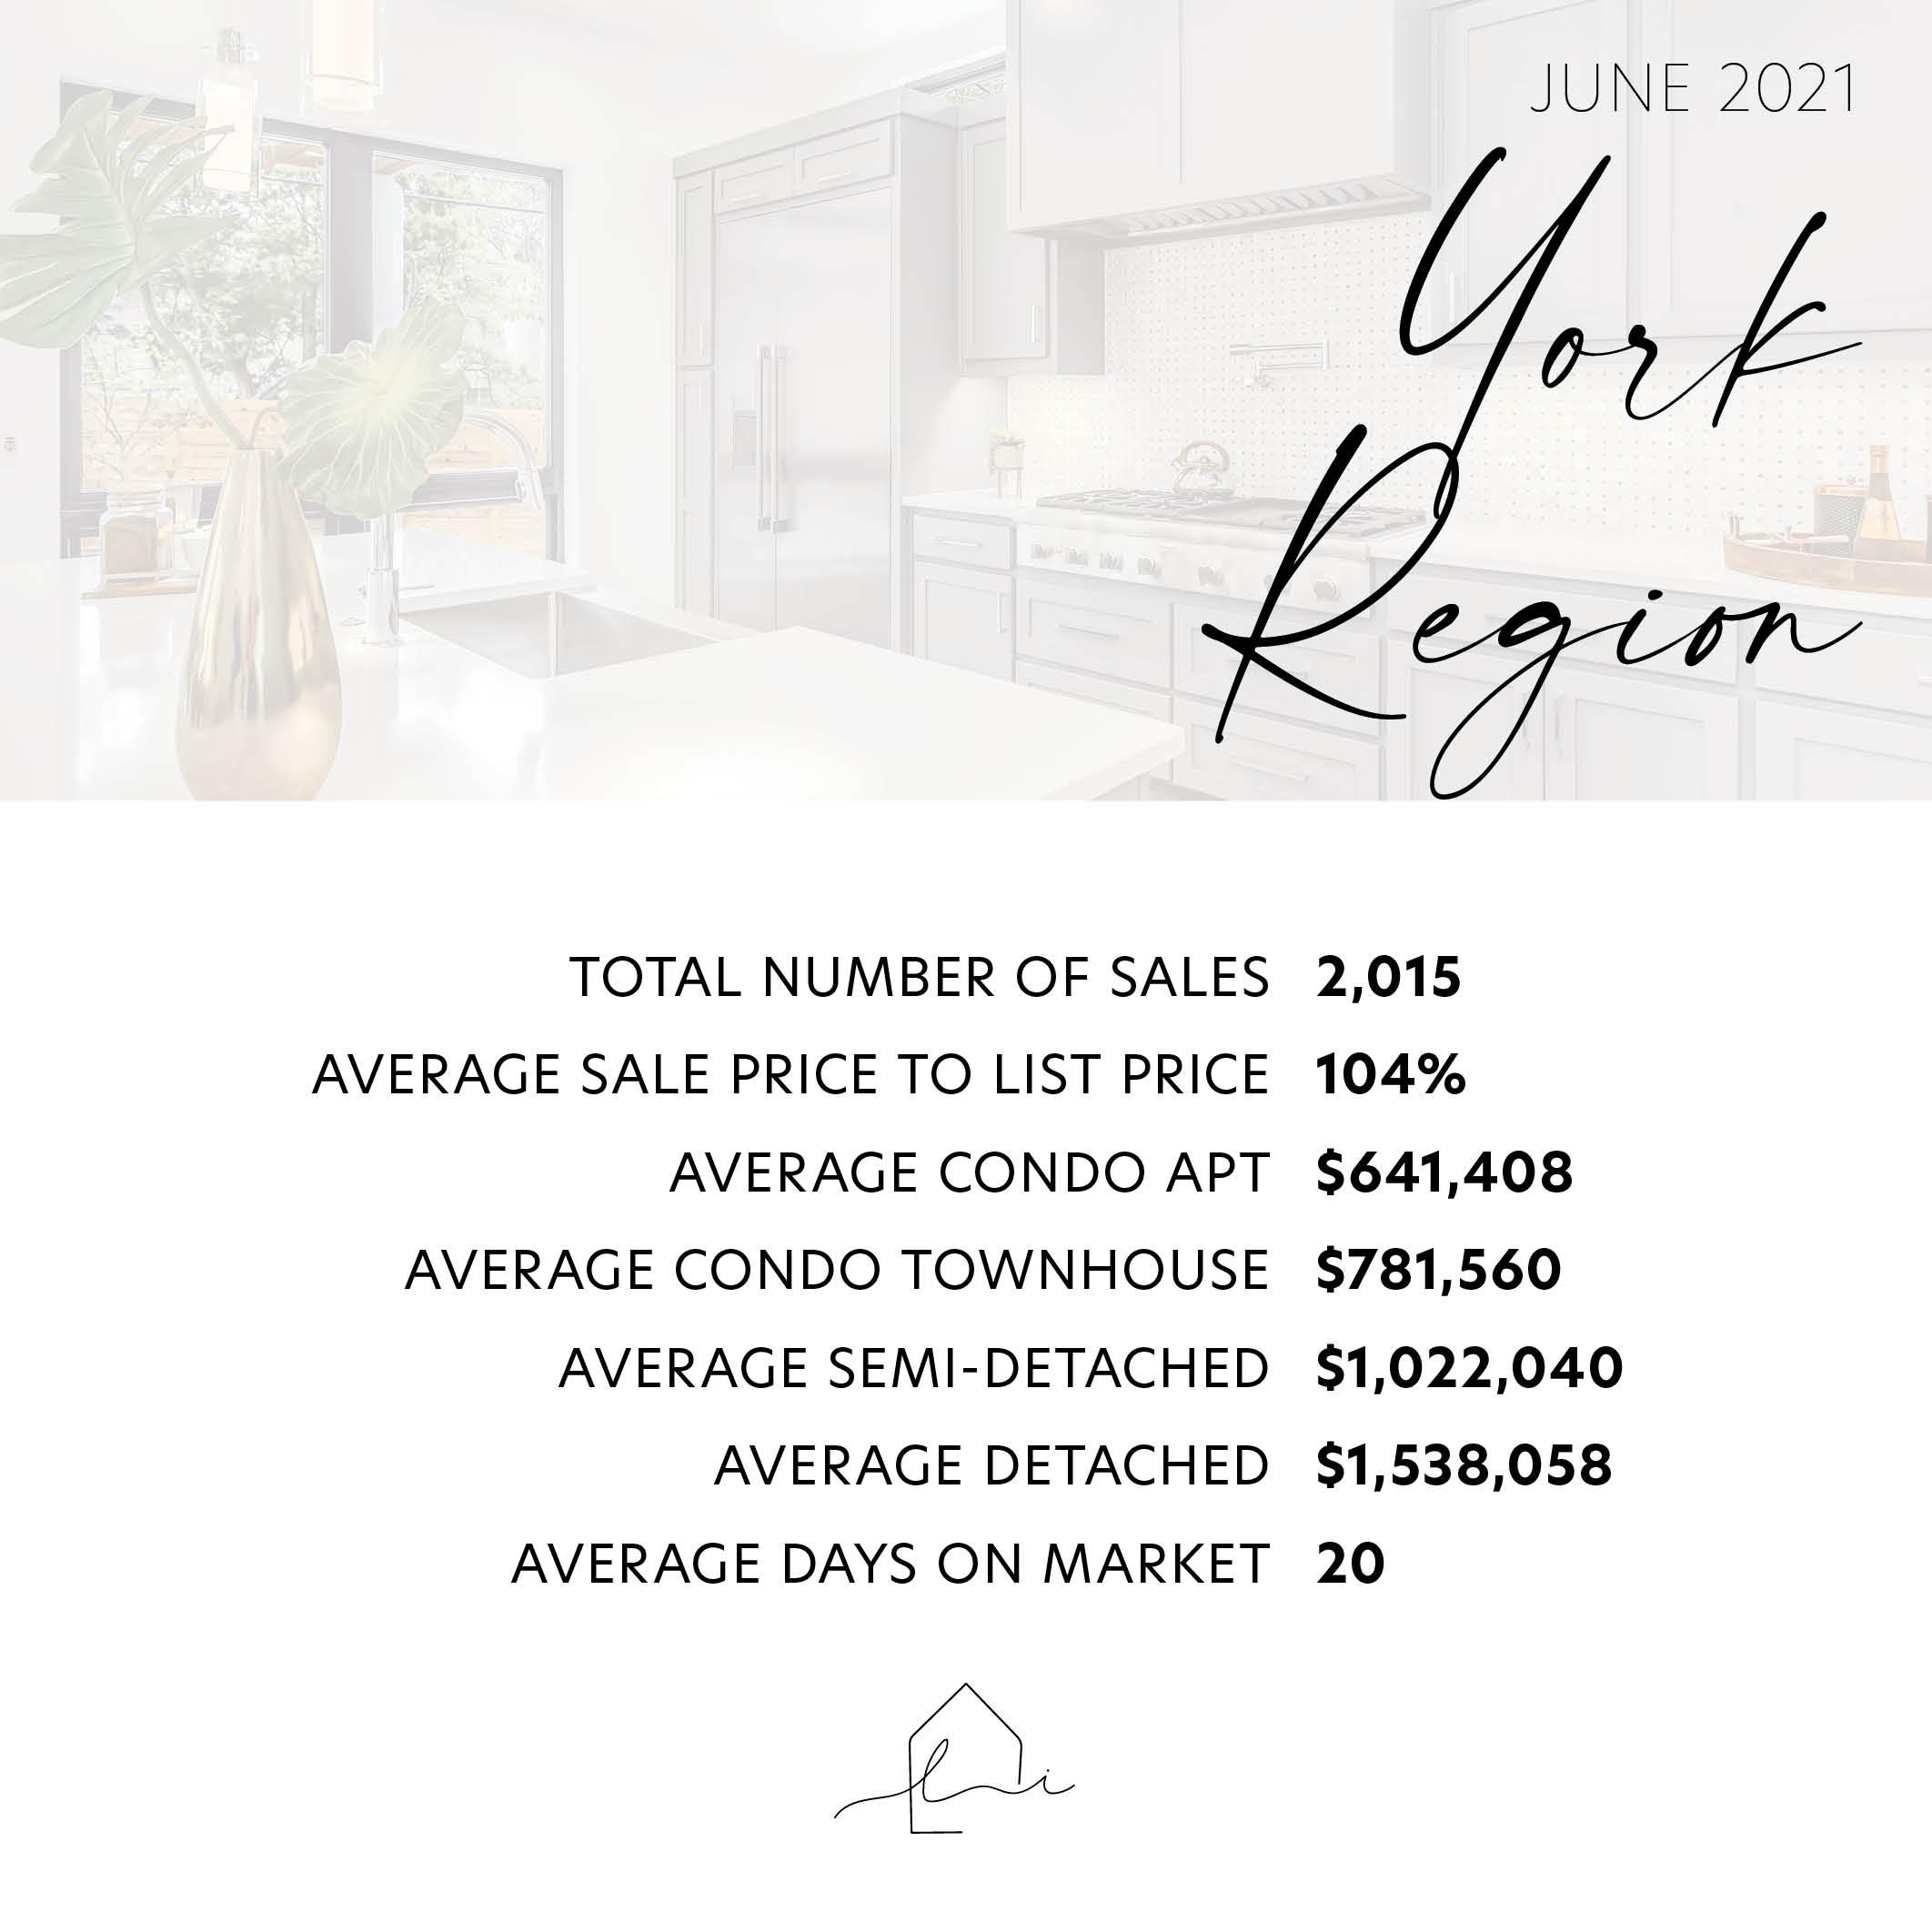 York Region June 2021 Statistics - Lara Stasiw Real Estate